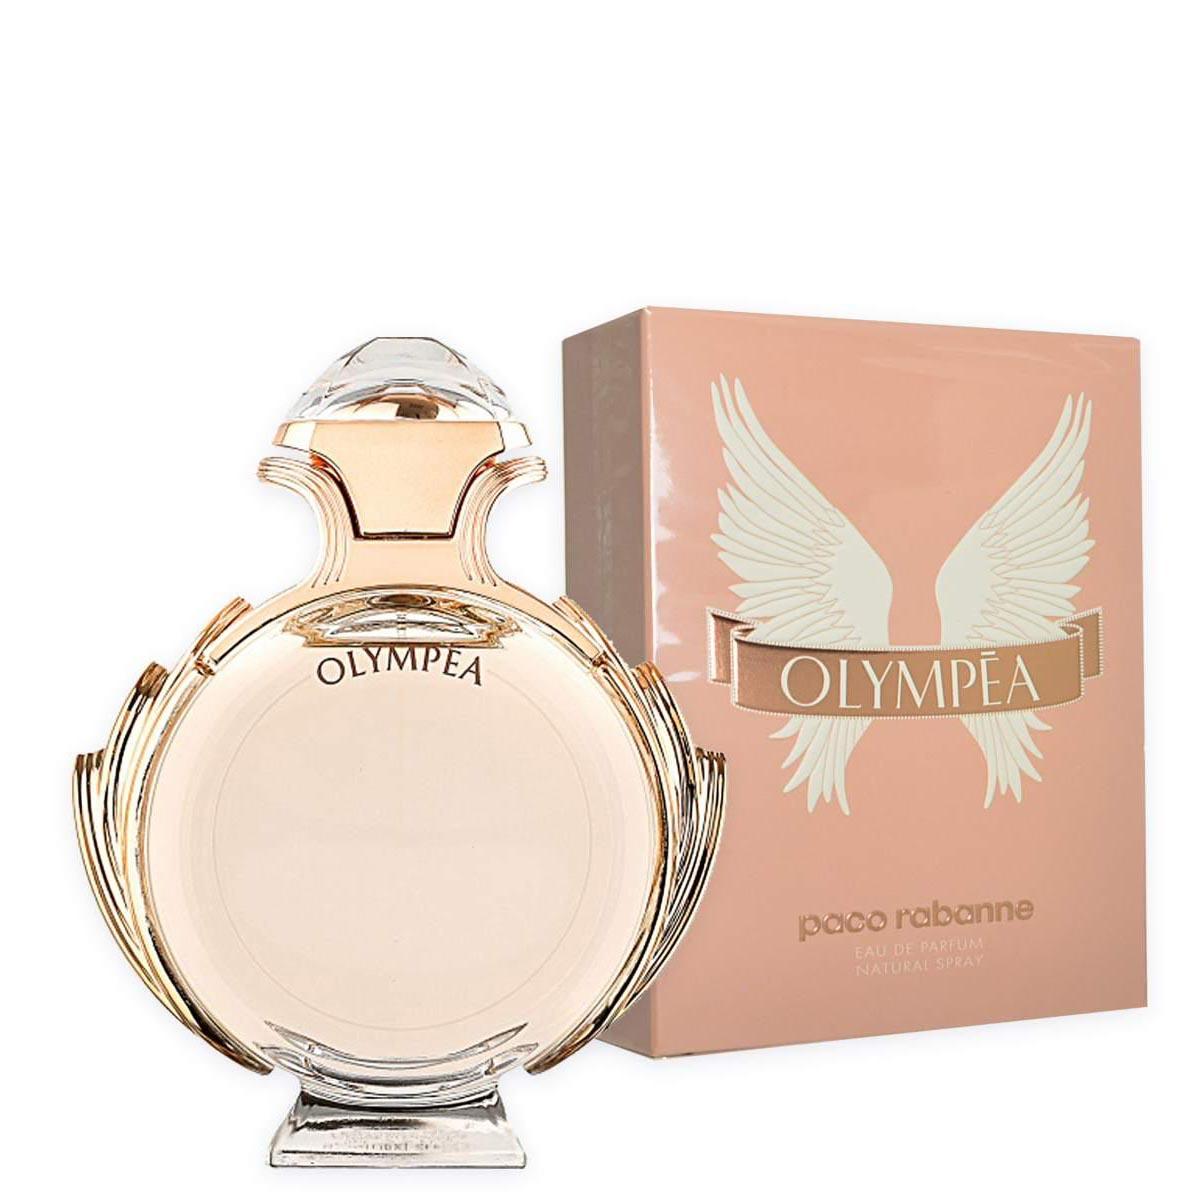 Paco rabanne olympea eau de parfum 30ml vaporizador